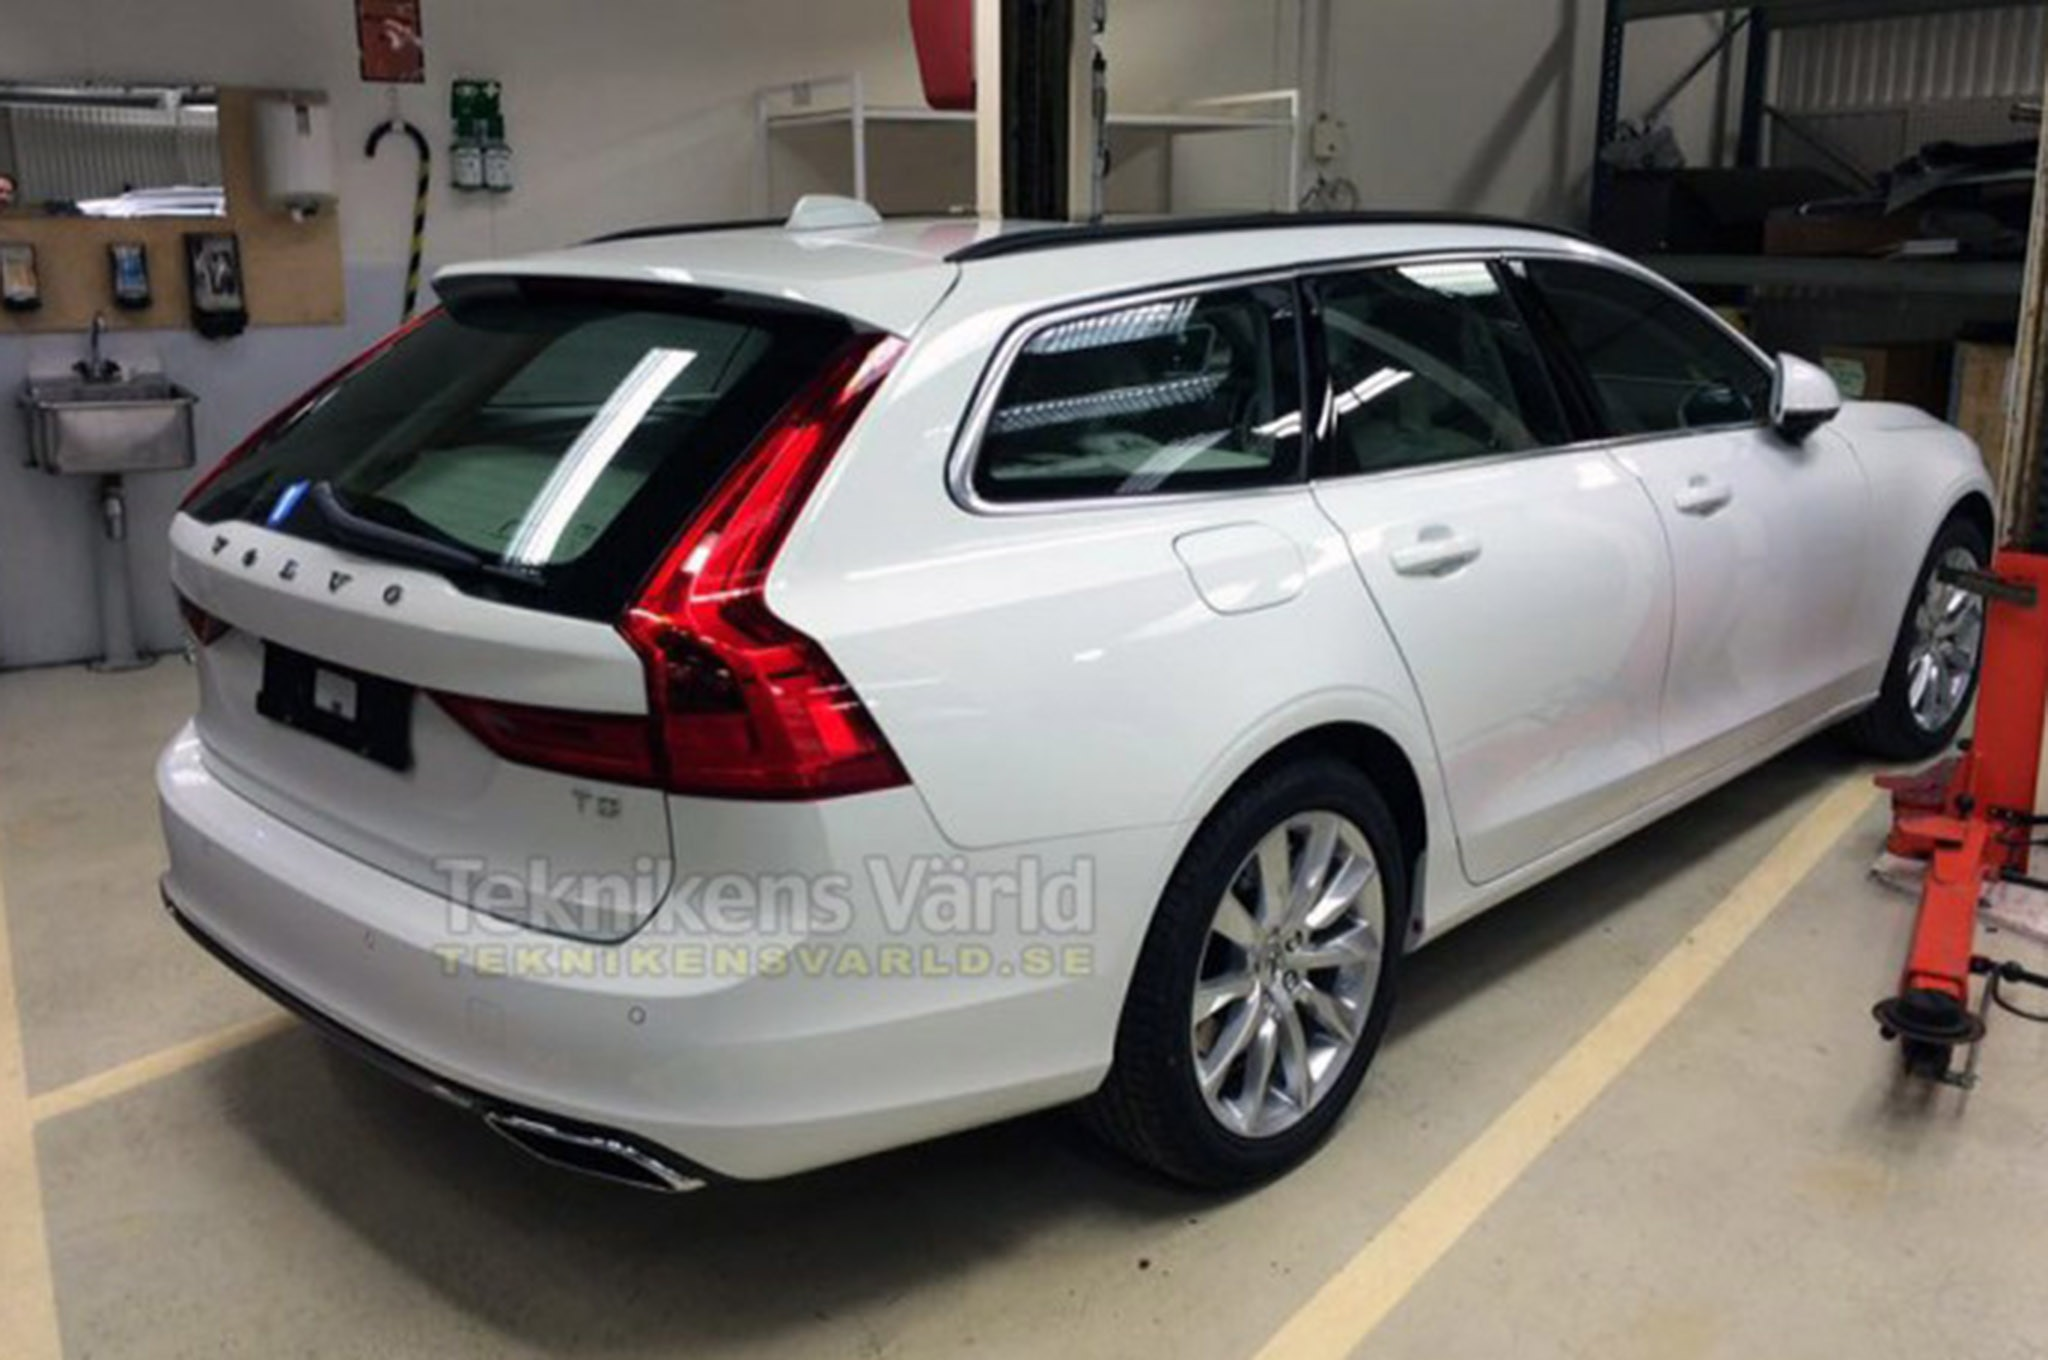 Volvo V90 Rear End Leaked Photo